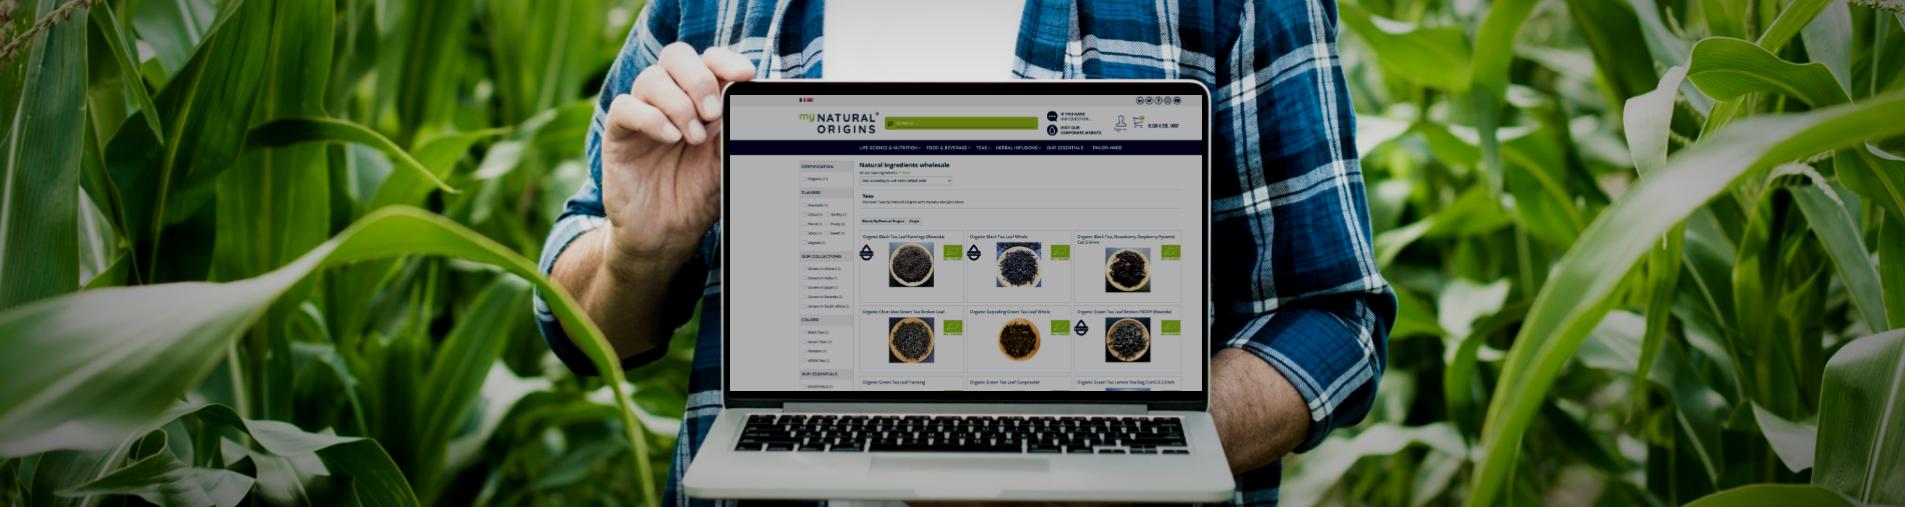 Discover the new Herbal and Teas segmentation product range on mynaturalorigins.store e-platform